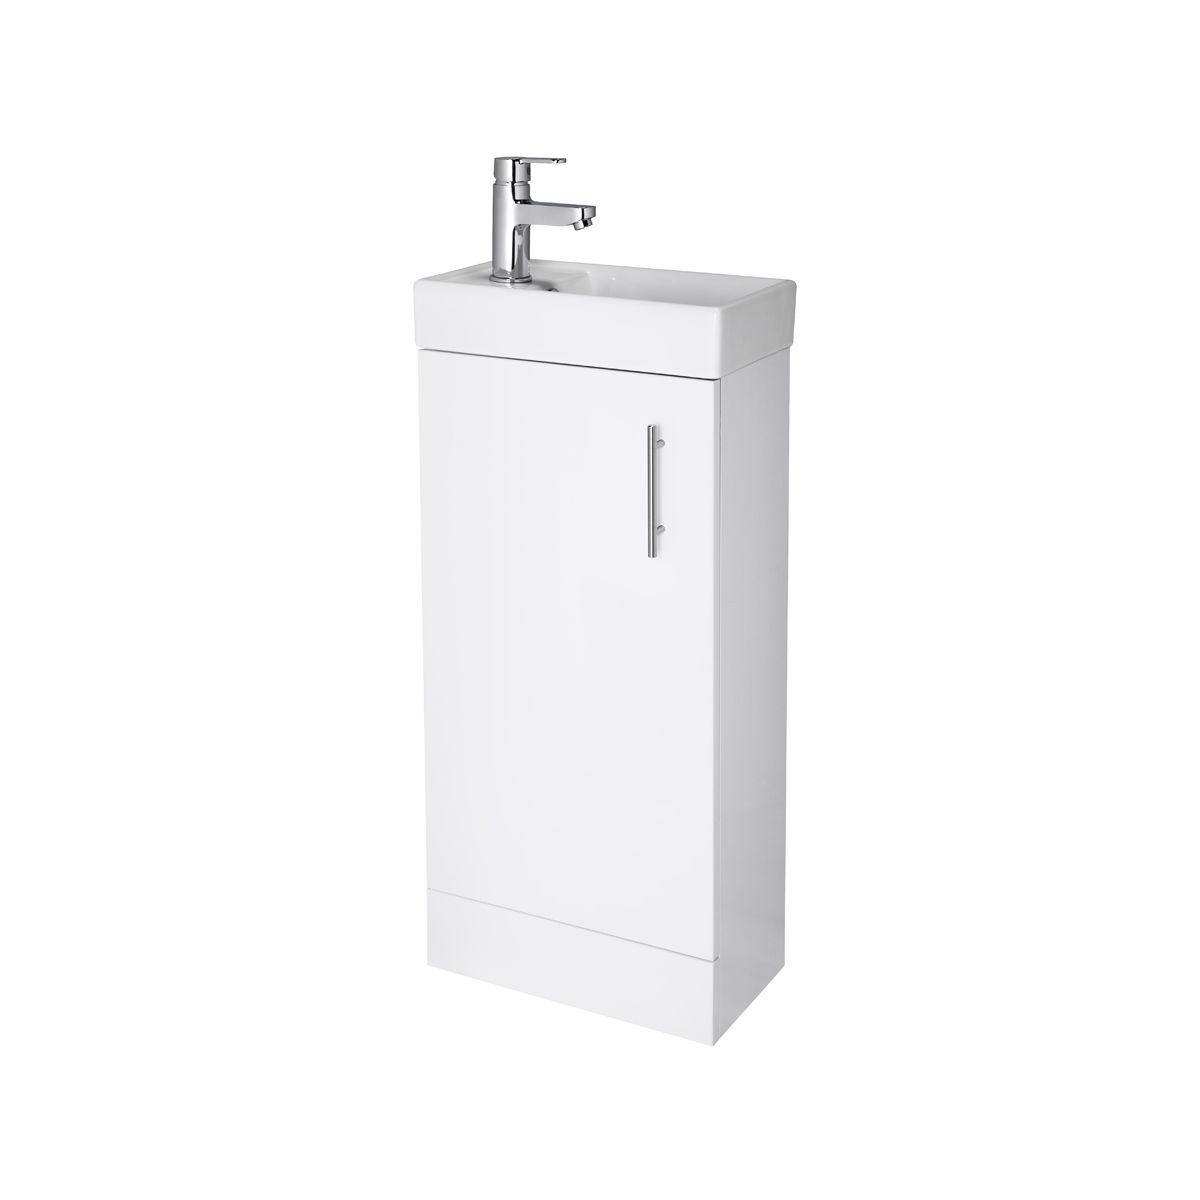 Premier Vault Gloss White Compact Vanity Unit 400mm